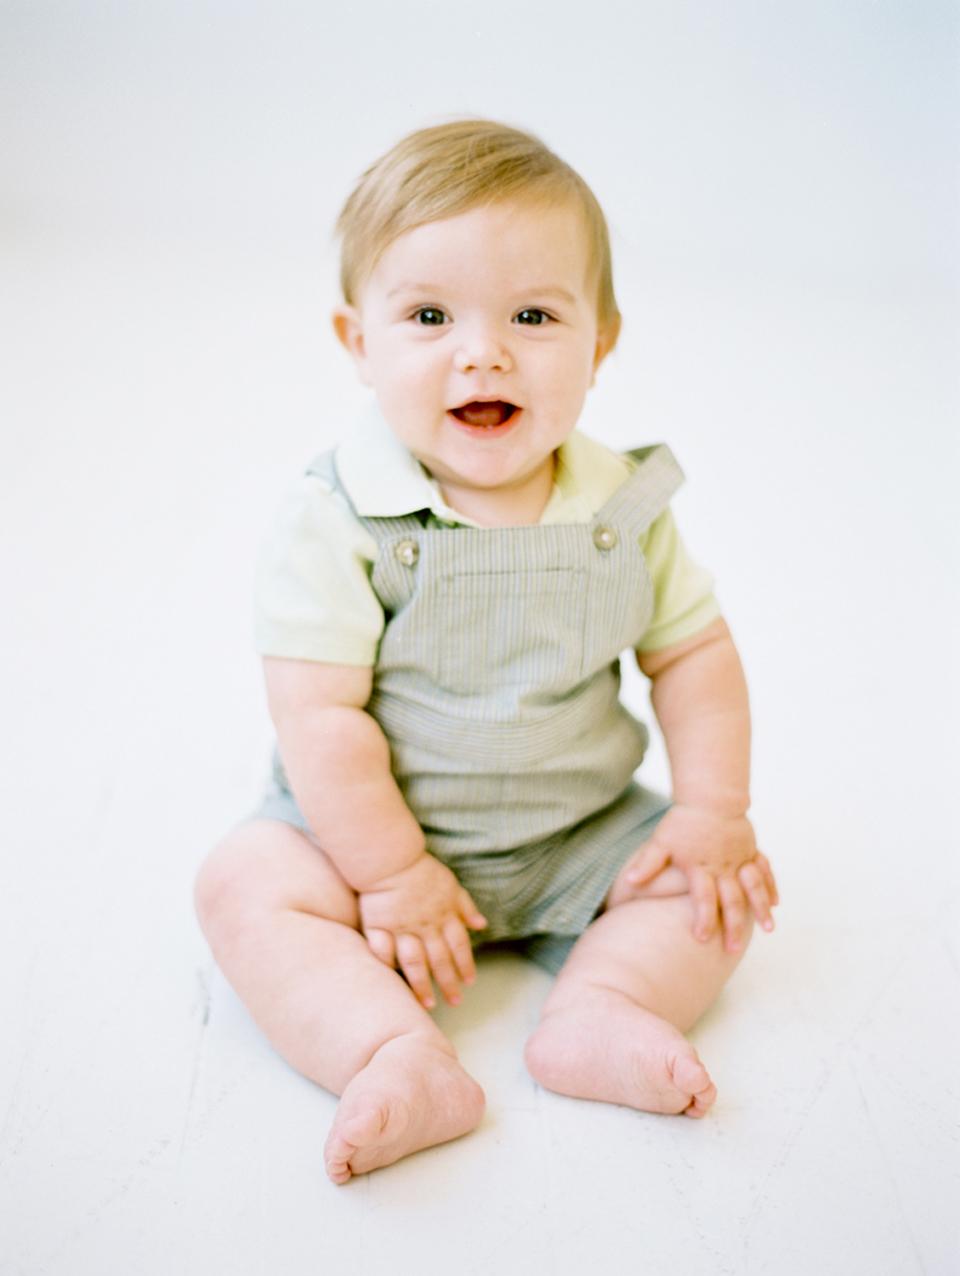 seattle-baby-photographer-oliver00117.JPG